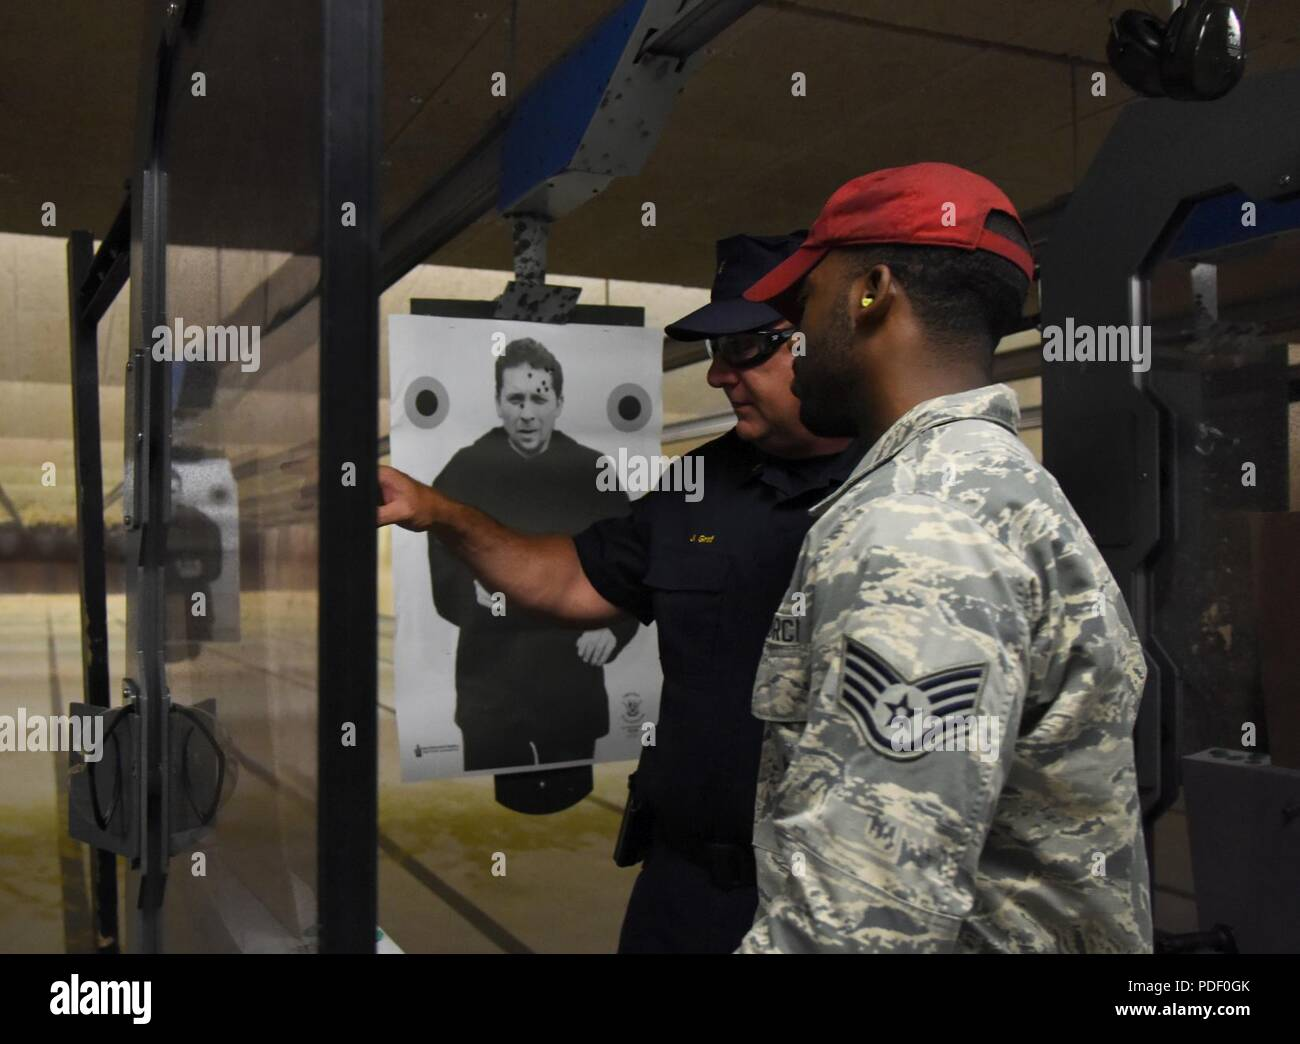 Pistol Shoot Stock Photos & Pistol Shoot Stock Images - Page 2 - Alamy